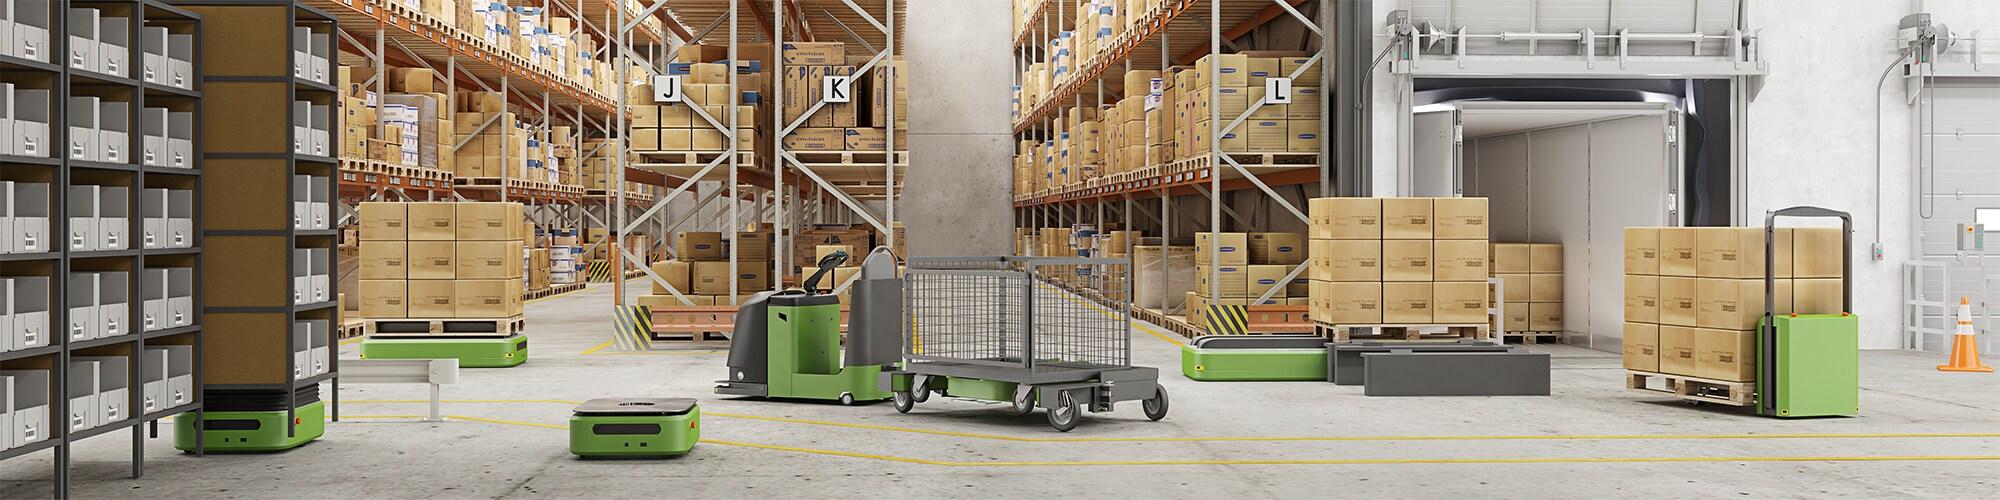 LINAK actuators in material handling applications such as autonomous mobile robots, tugger trains and pallet trucks.